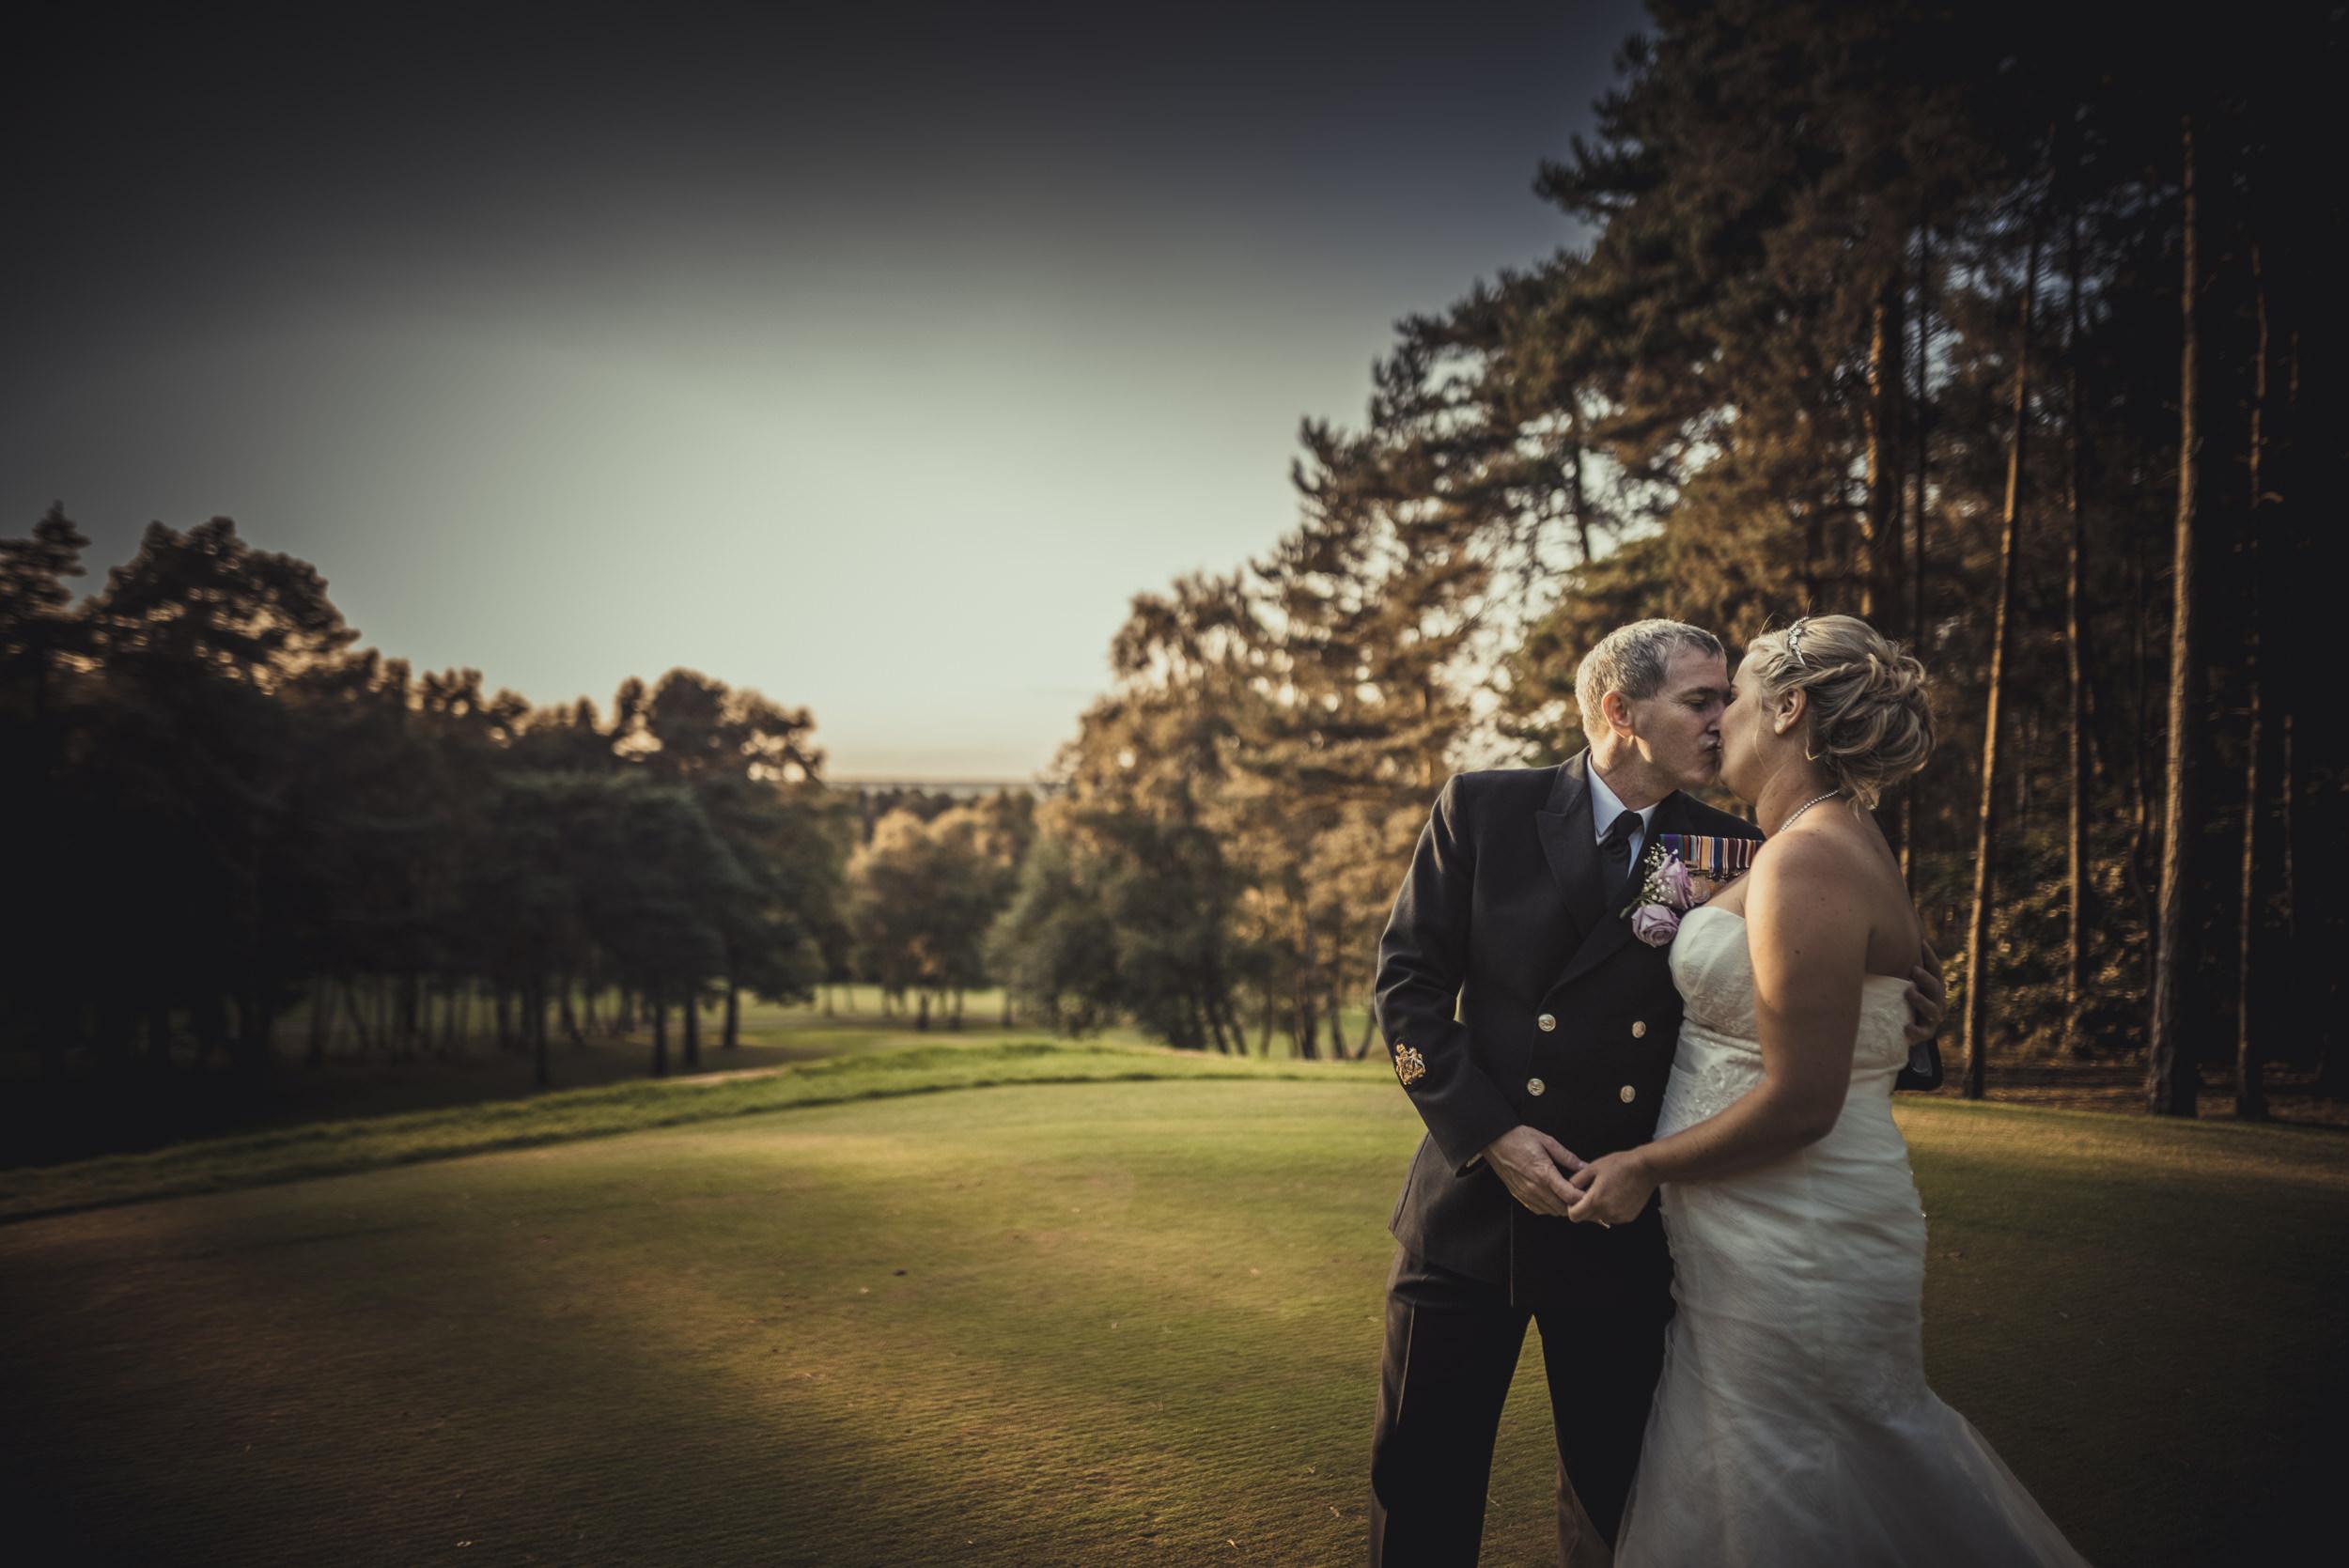 Chantelle-and-Stephen-Old-Thorns-Hotel-Wedding-Liphook-Manu-Mendoza-Wedding-Photography-469.jpg